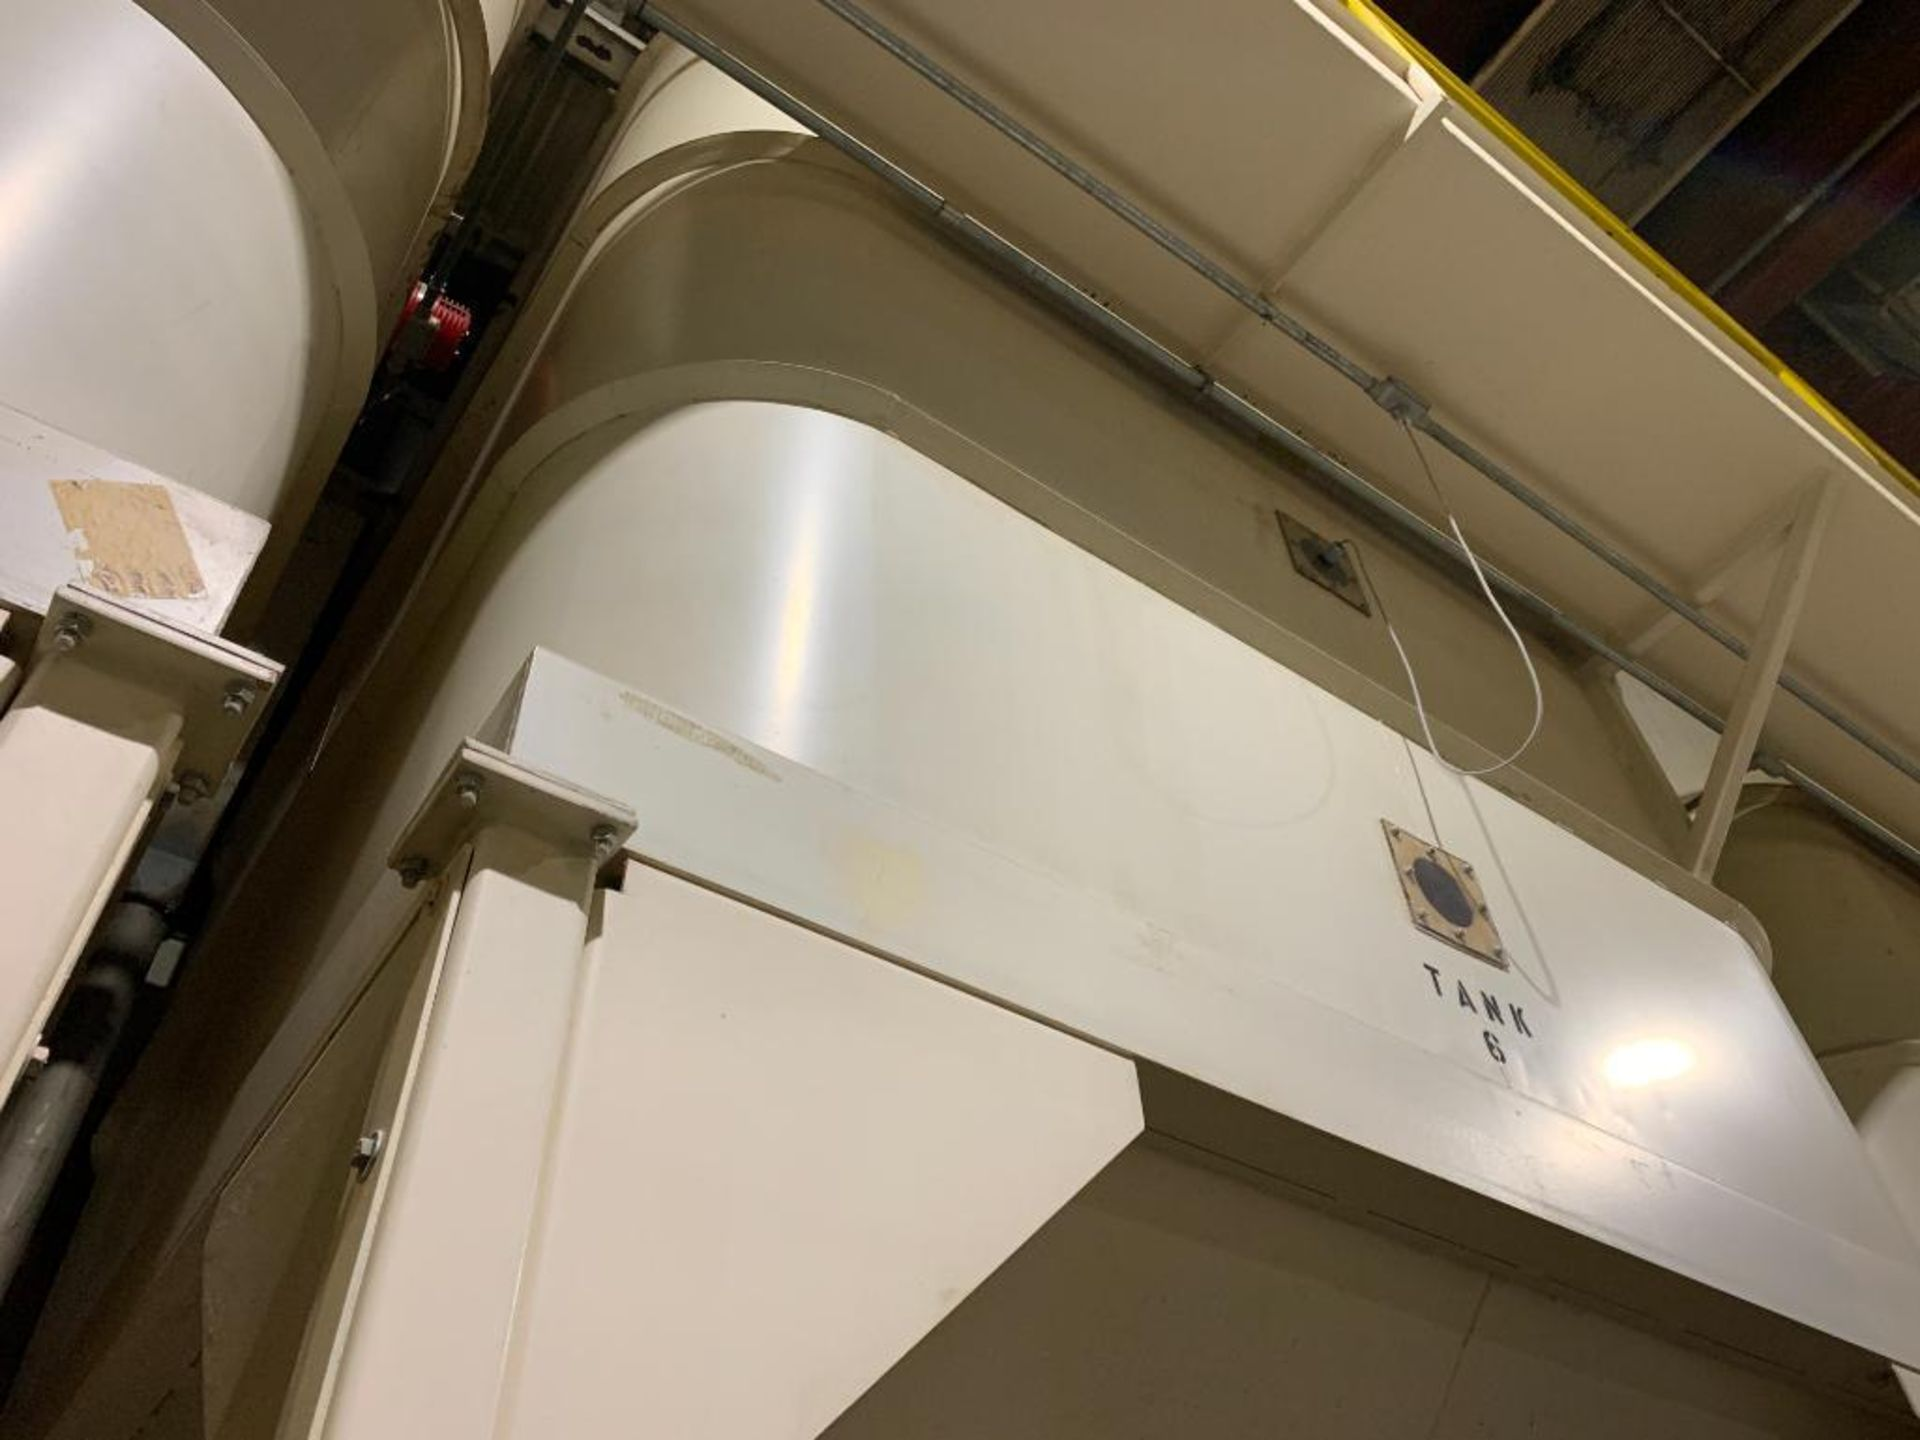 Aseeco mild steel cone bottom bulk storage bin - Image 15 of 27